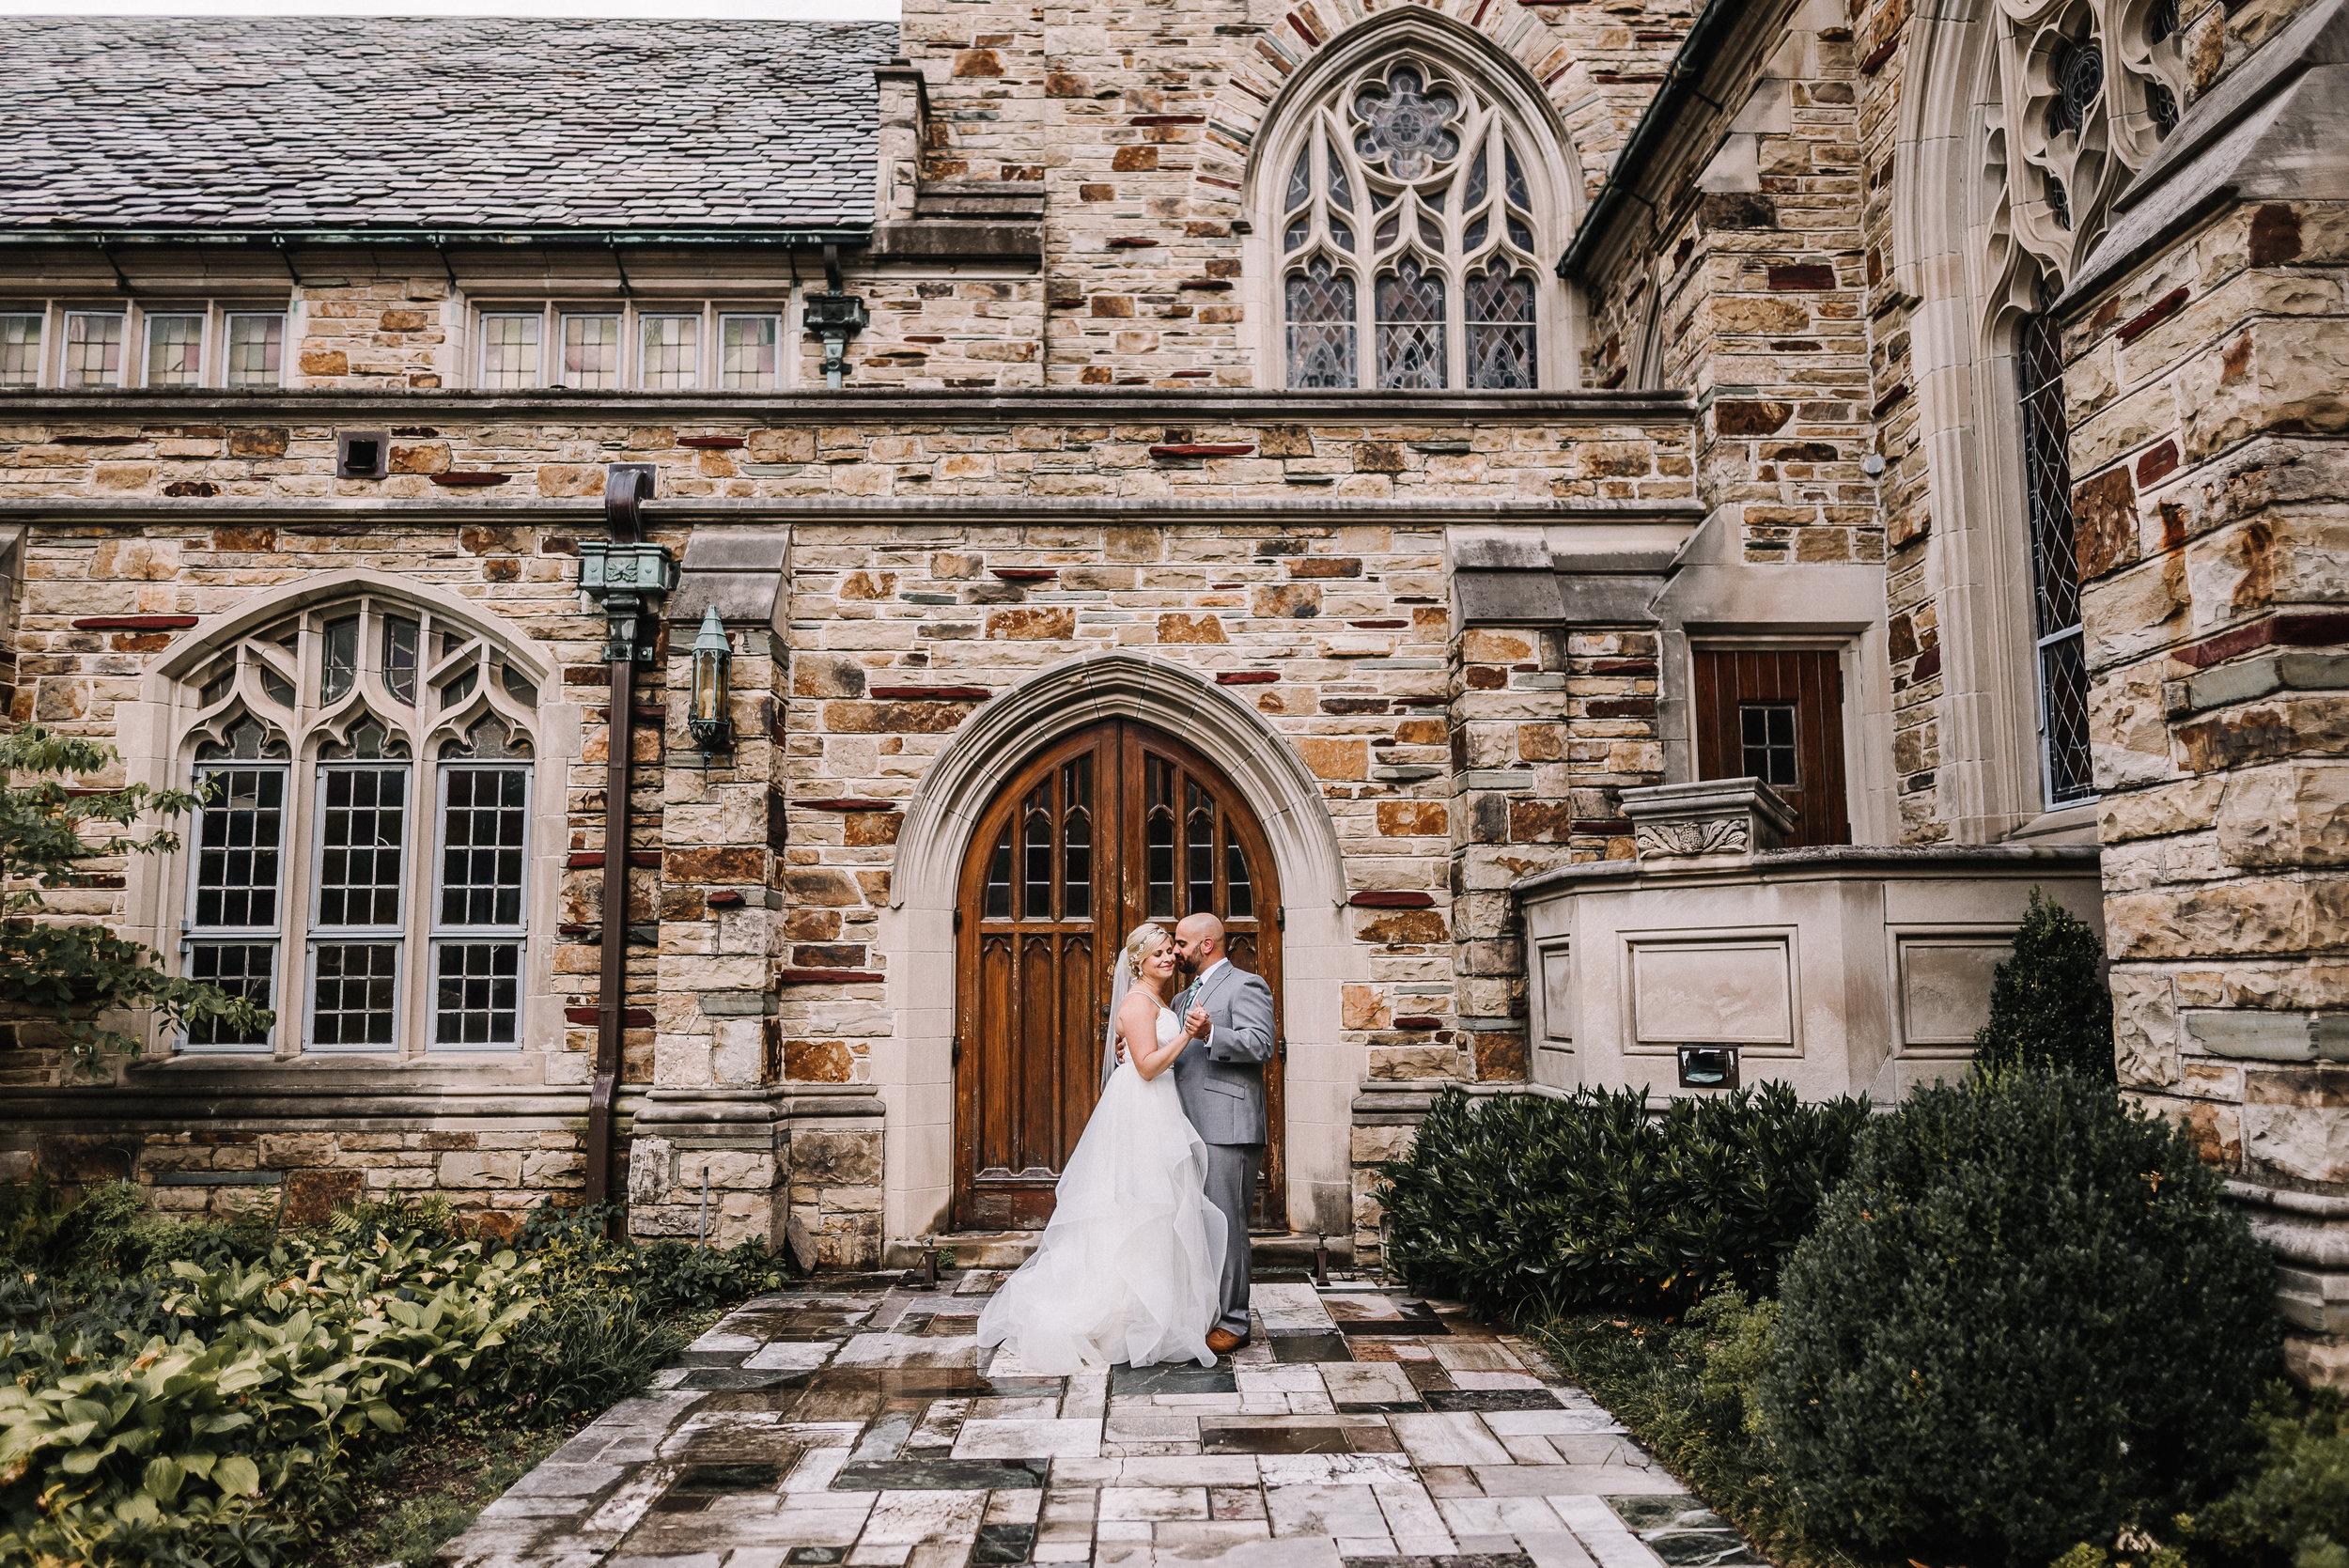 Idlewild_Church_Myers_Wedding_Ashley-Benham-Photography-32.jpg